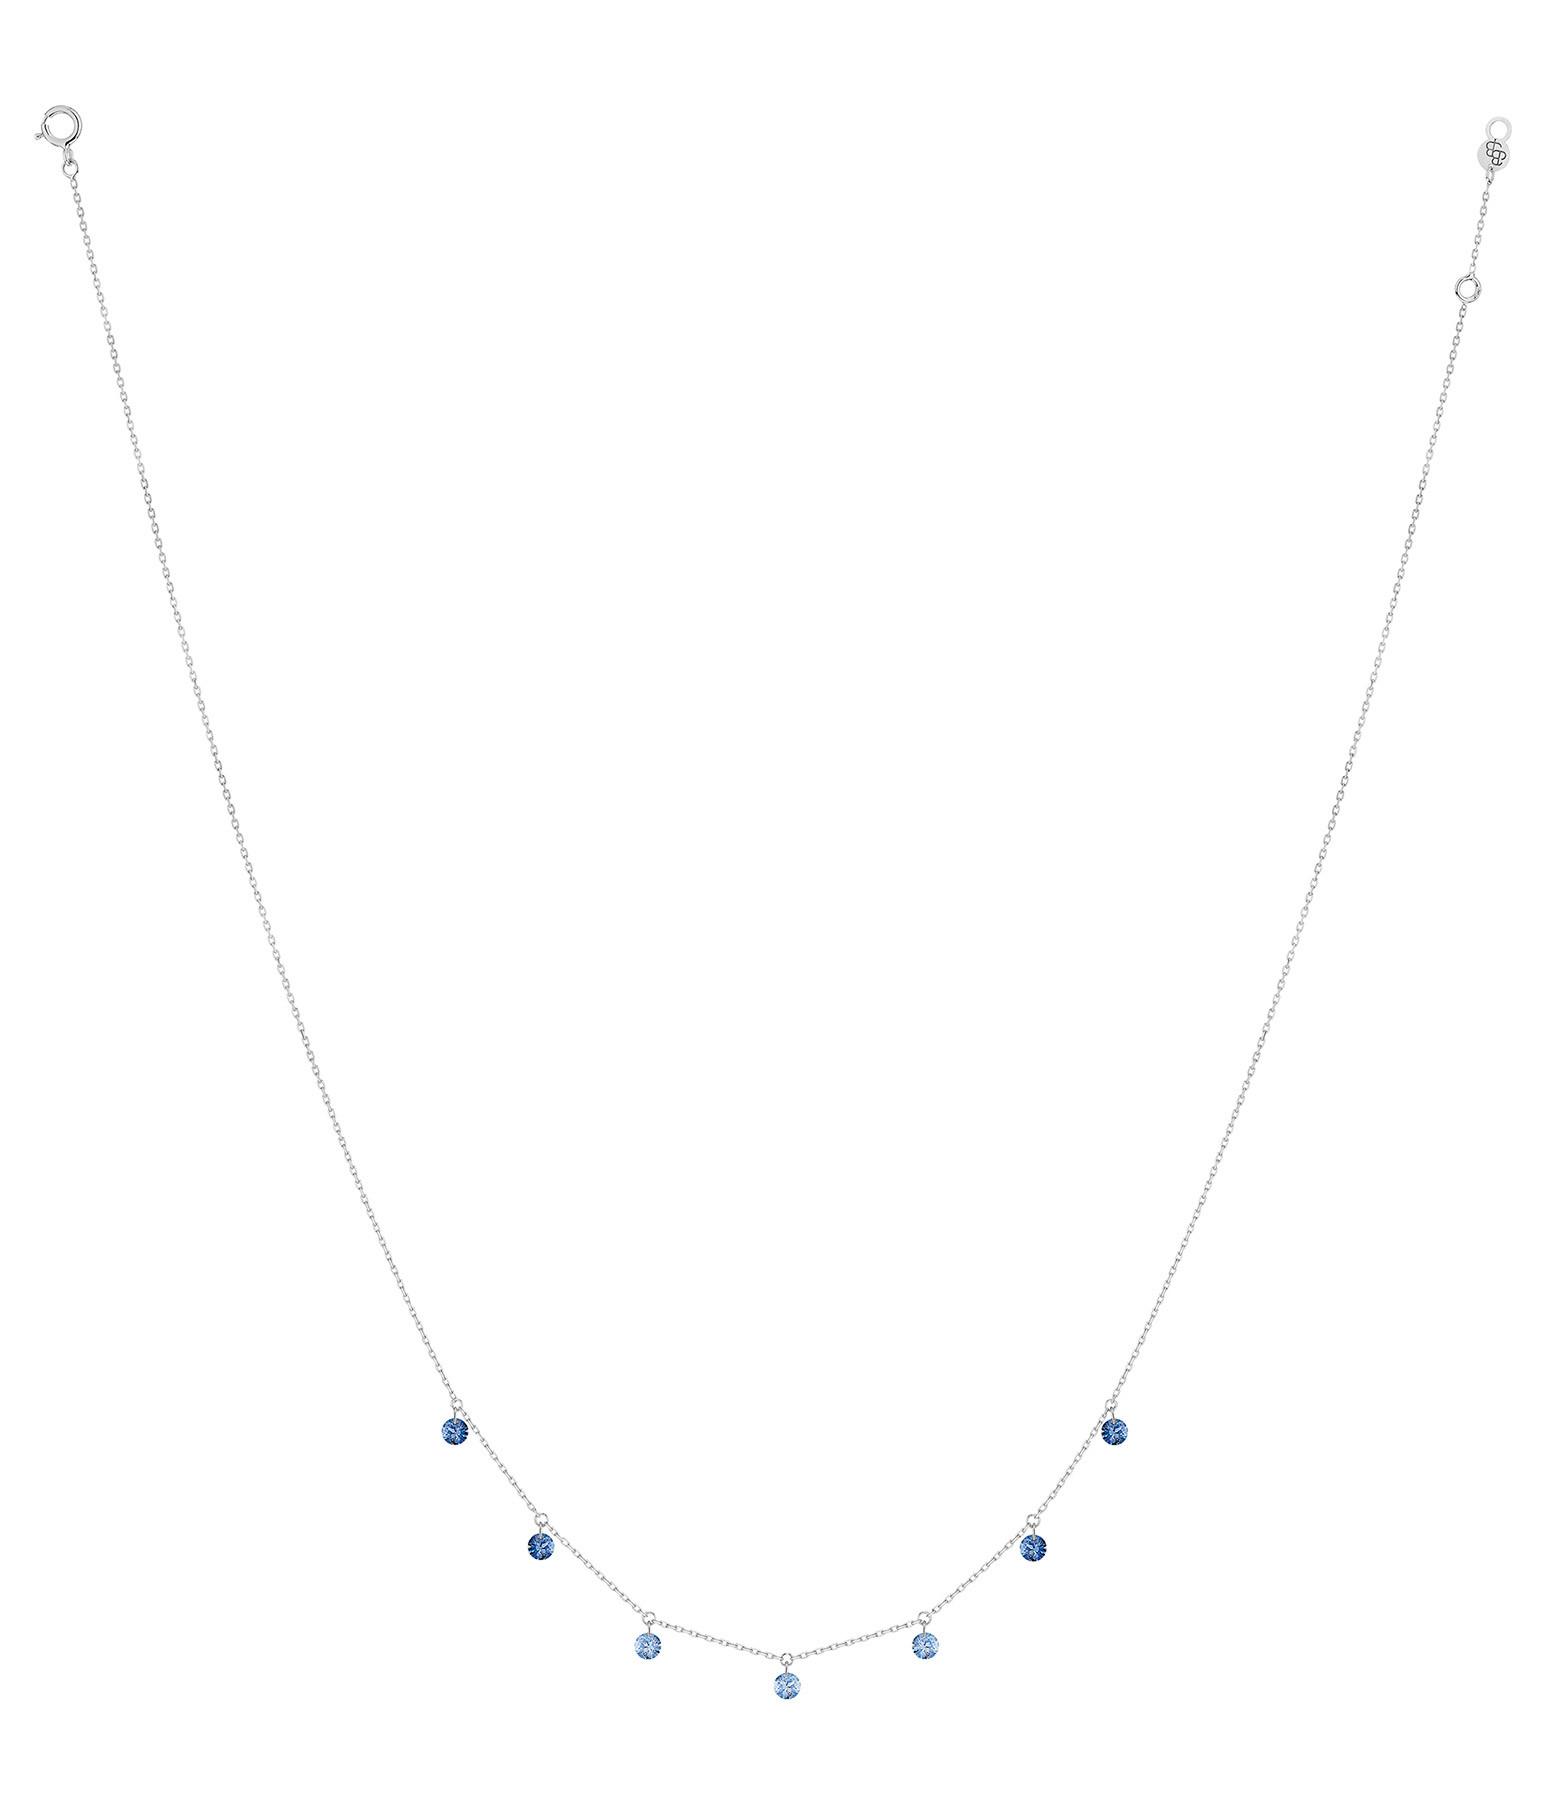 LA BRUNE & LA BLONDE - Collier Confetti 7 Saphirs Bleus Or Blanc